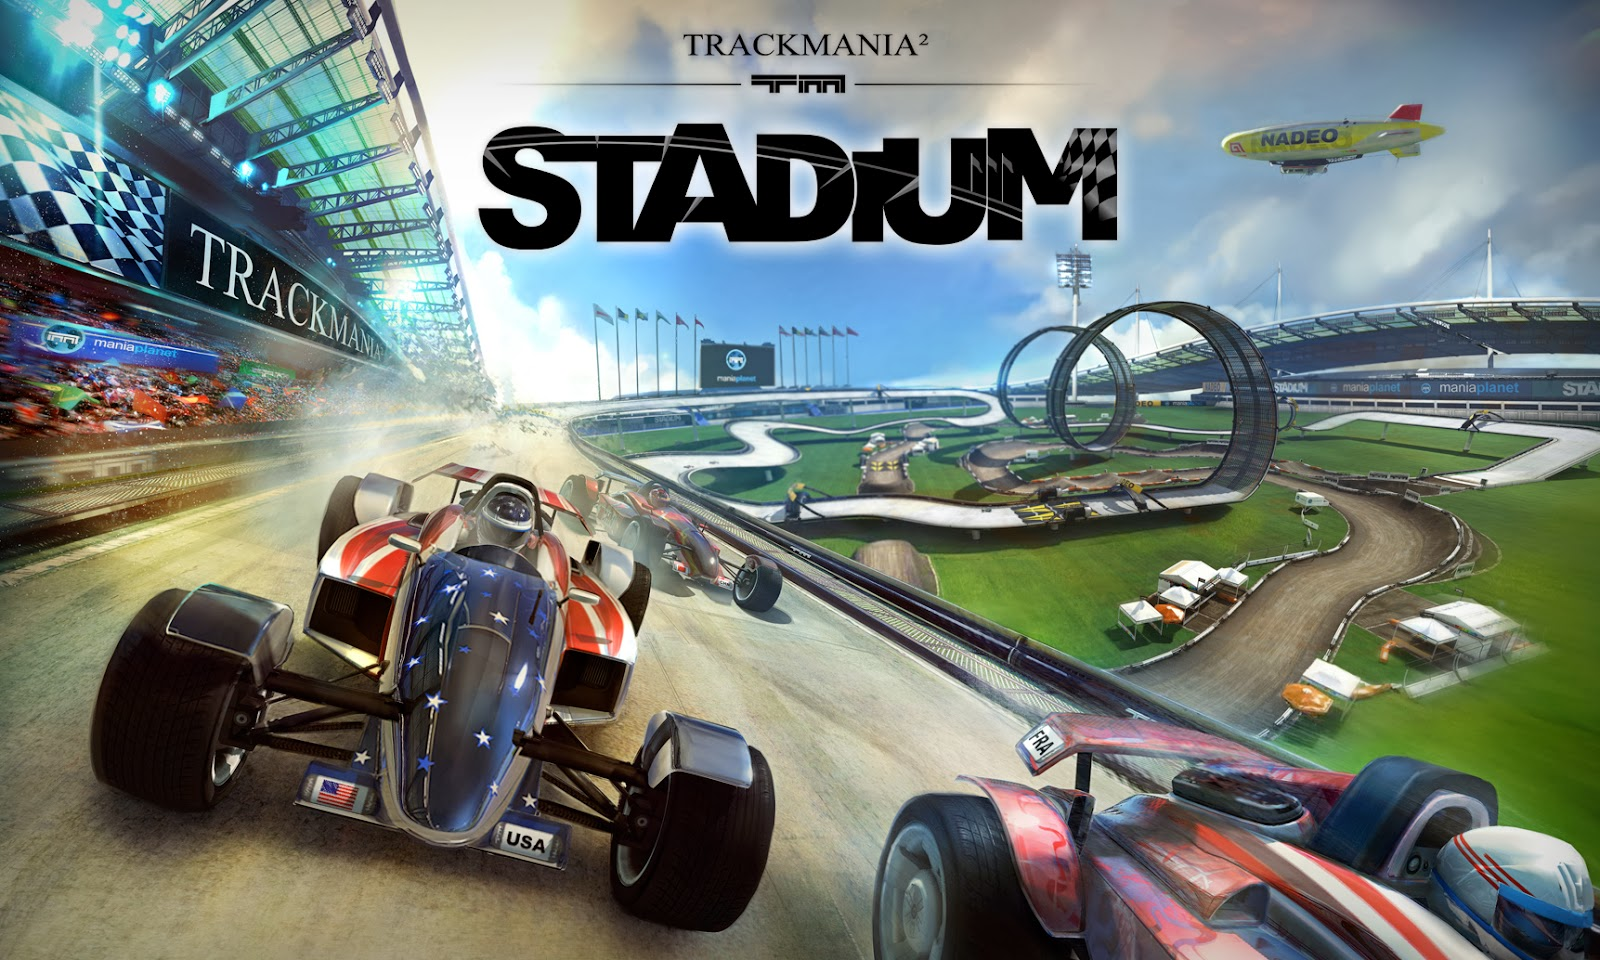 Blog Game  Trackmania 2 Stadium: Free Download Pc Games Full Crack